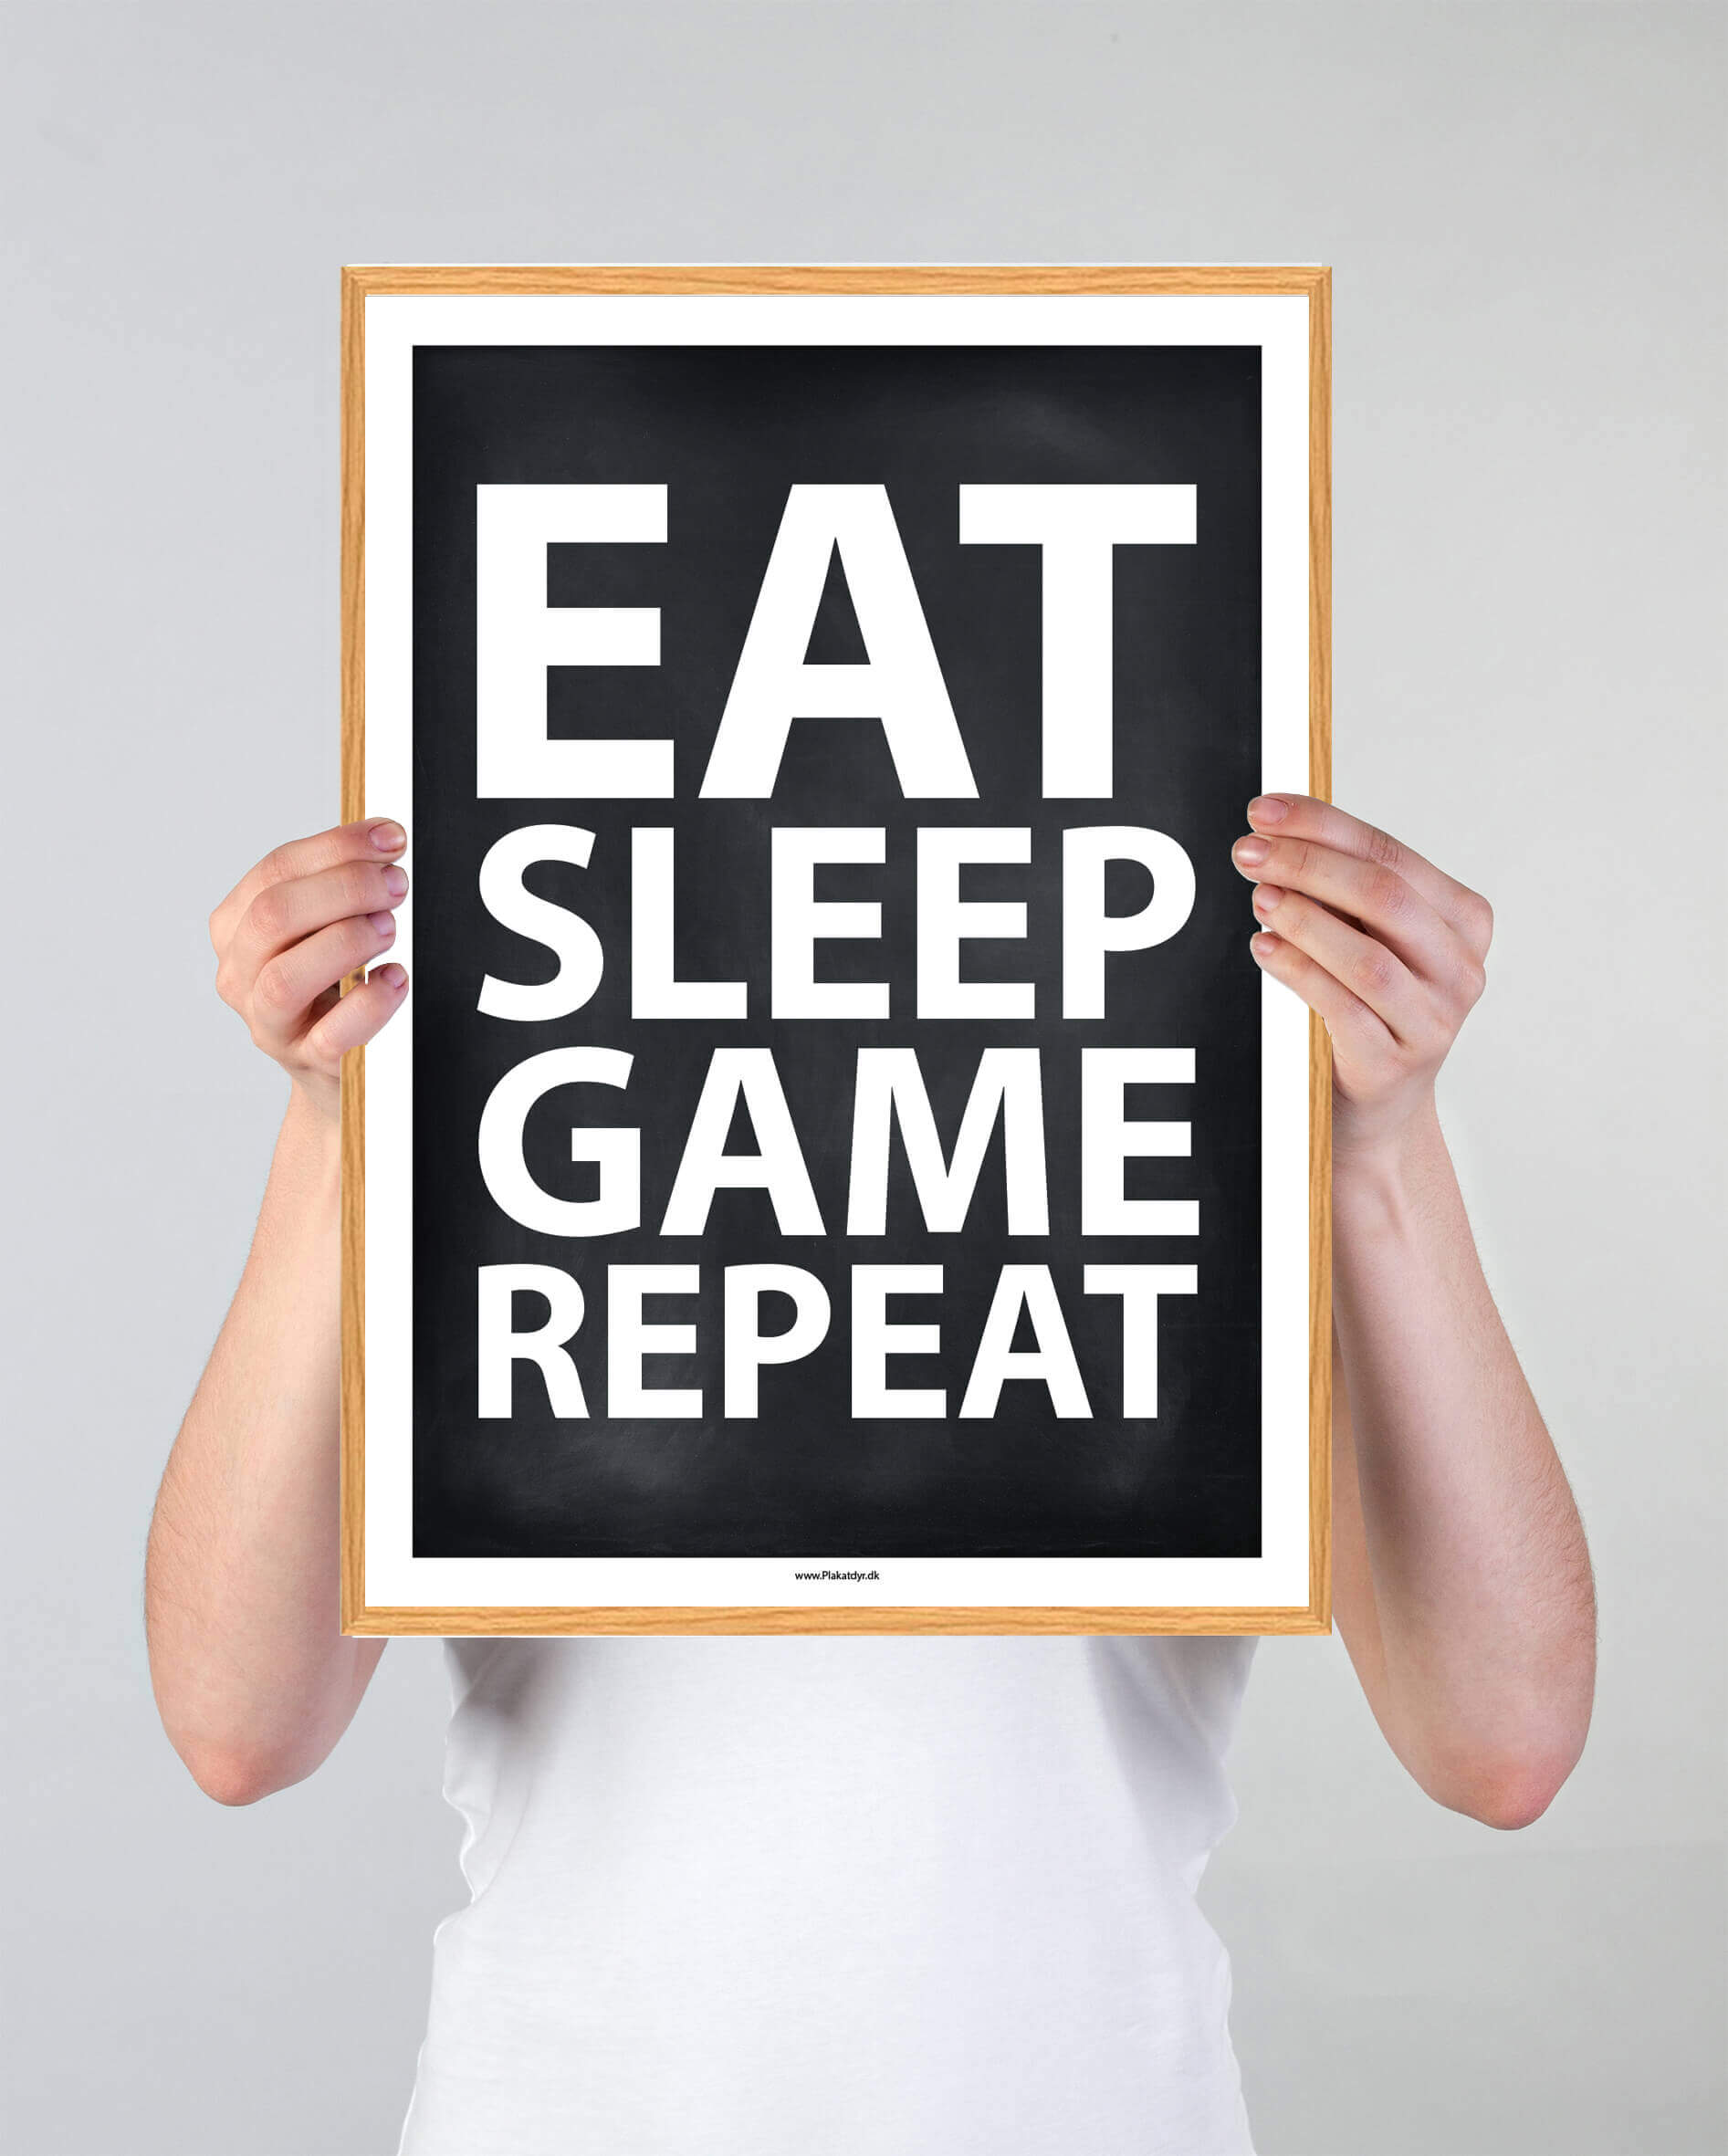 Eat-sleep-game-repeat-2